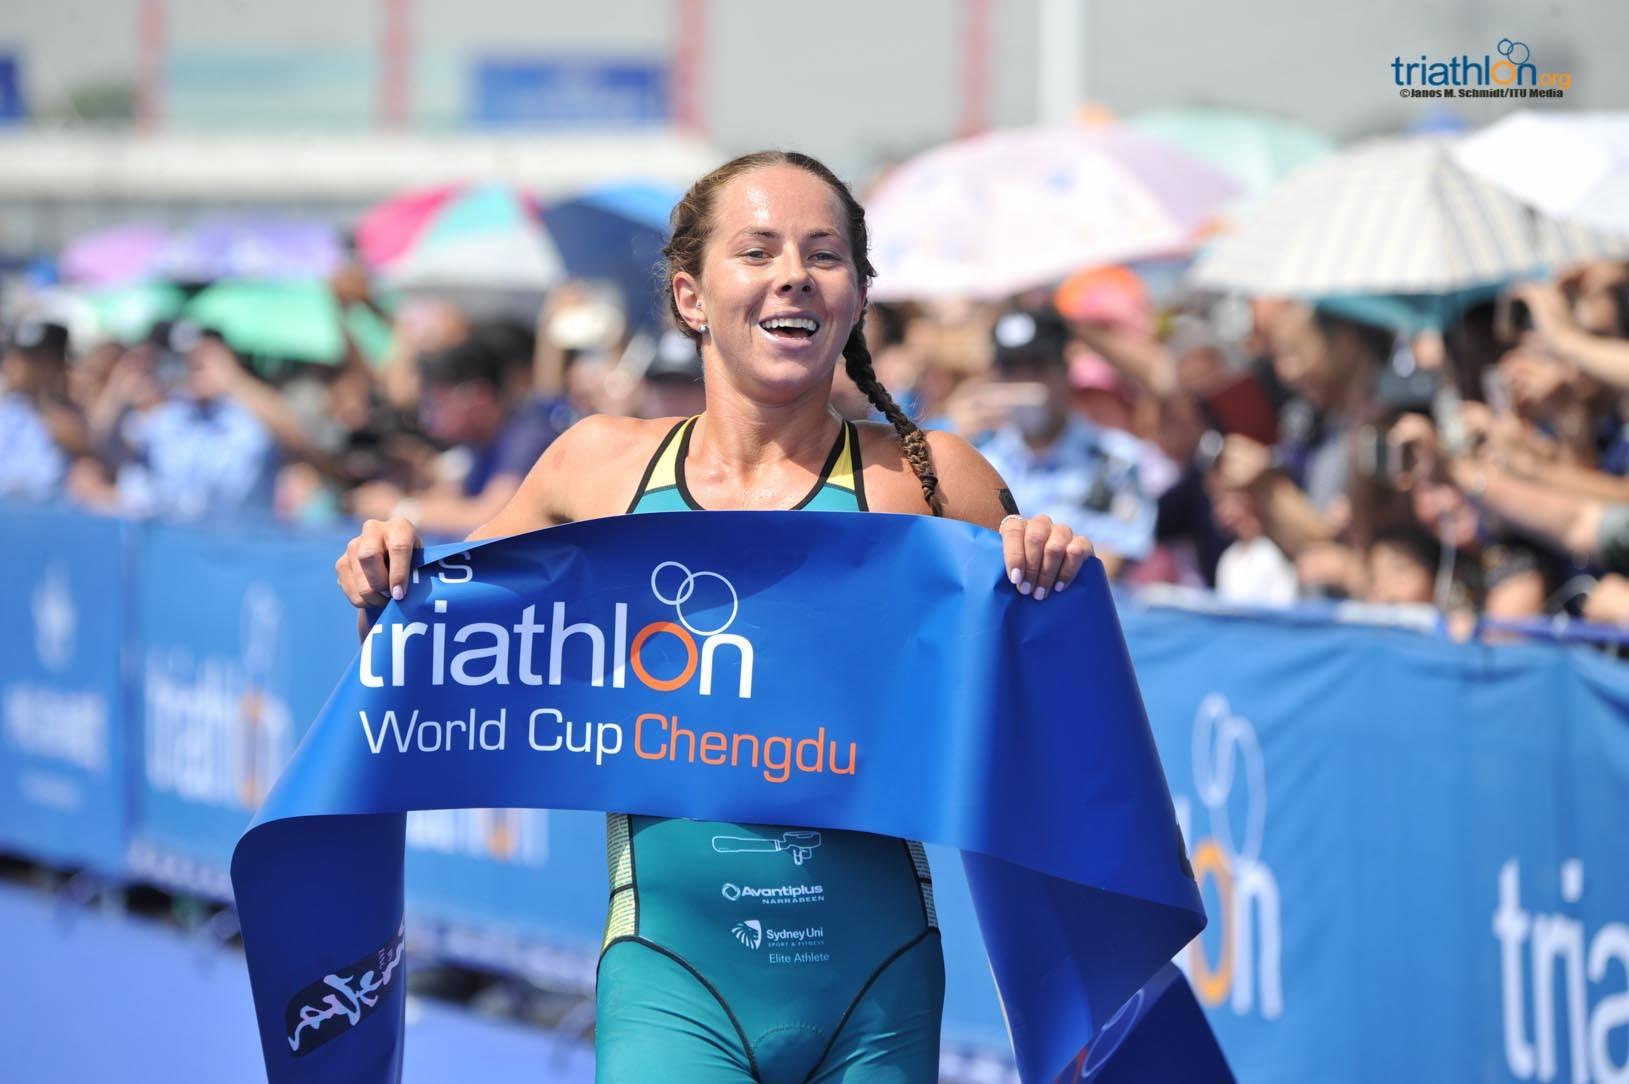 L'australiana Emma Jeffcoat vince l'ITU World Cup Chengu 2018 (Foto: ITU Media/Triathlon.org)